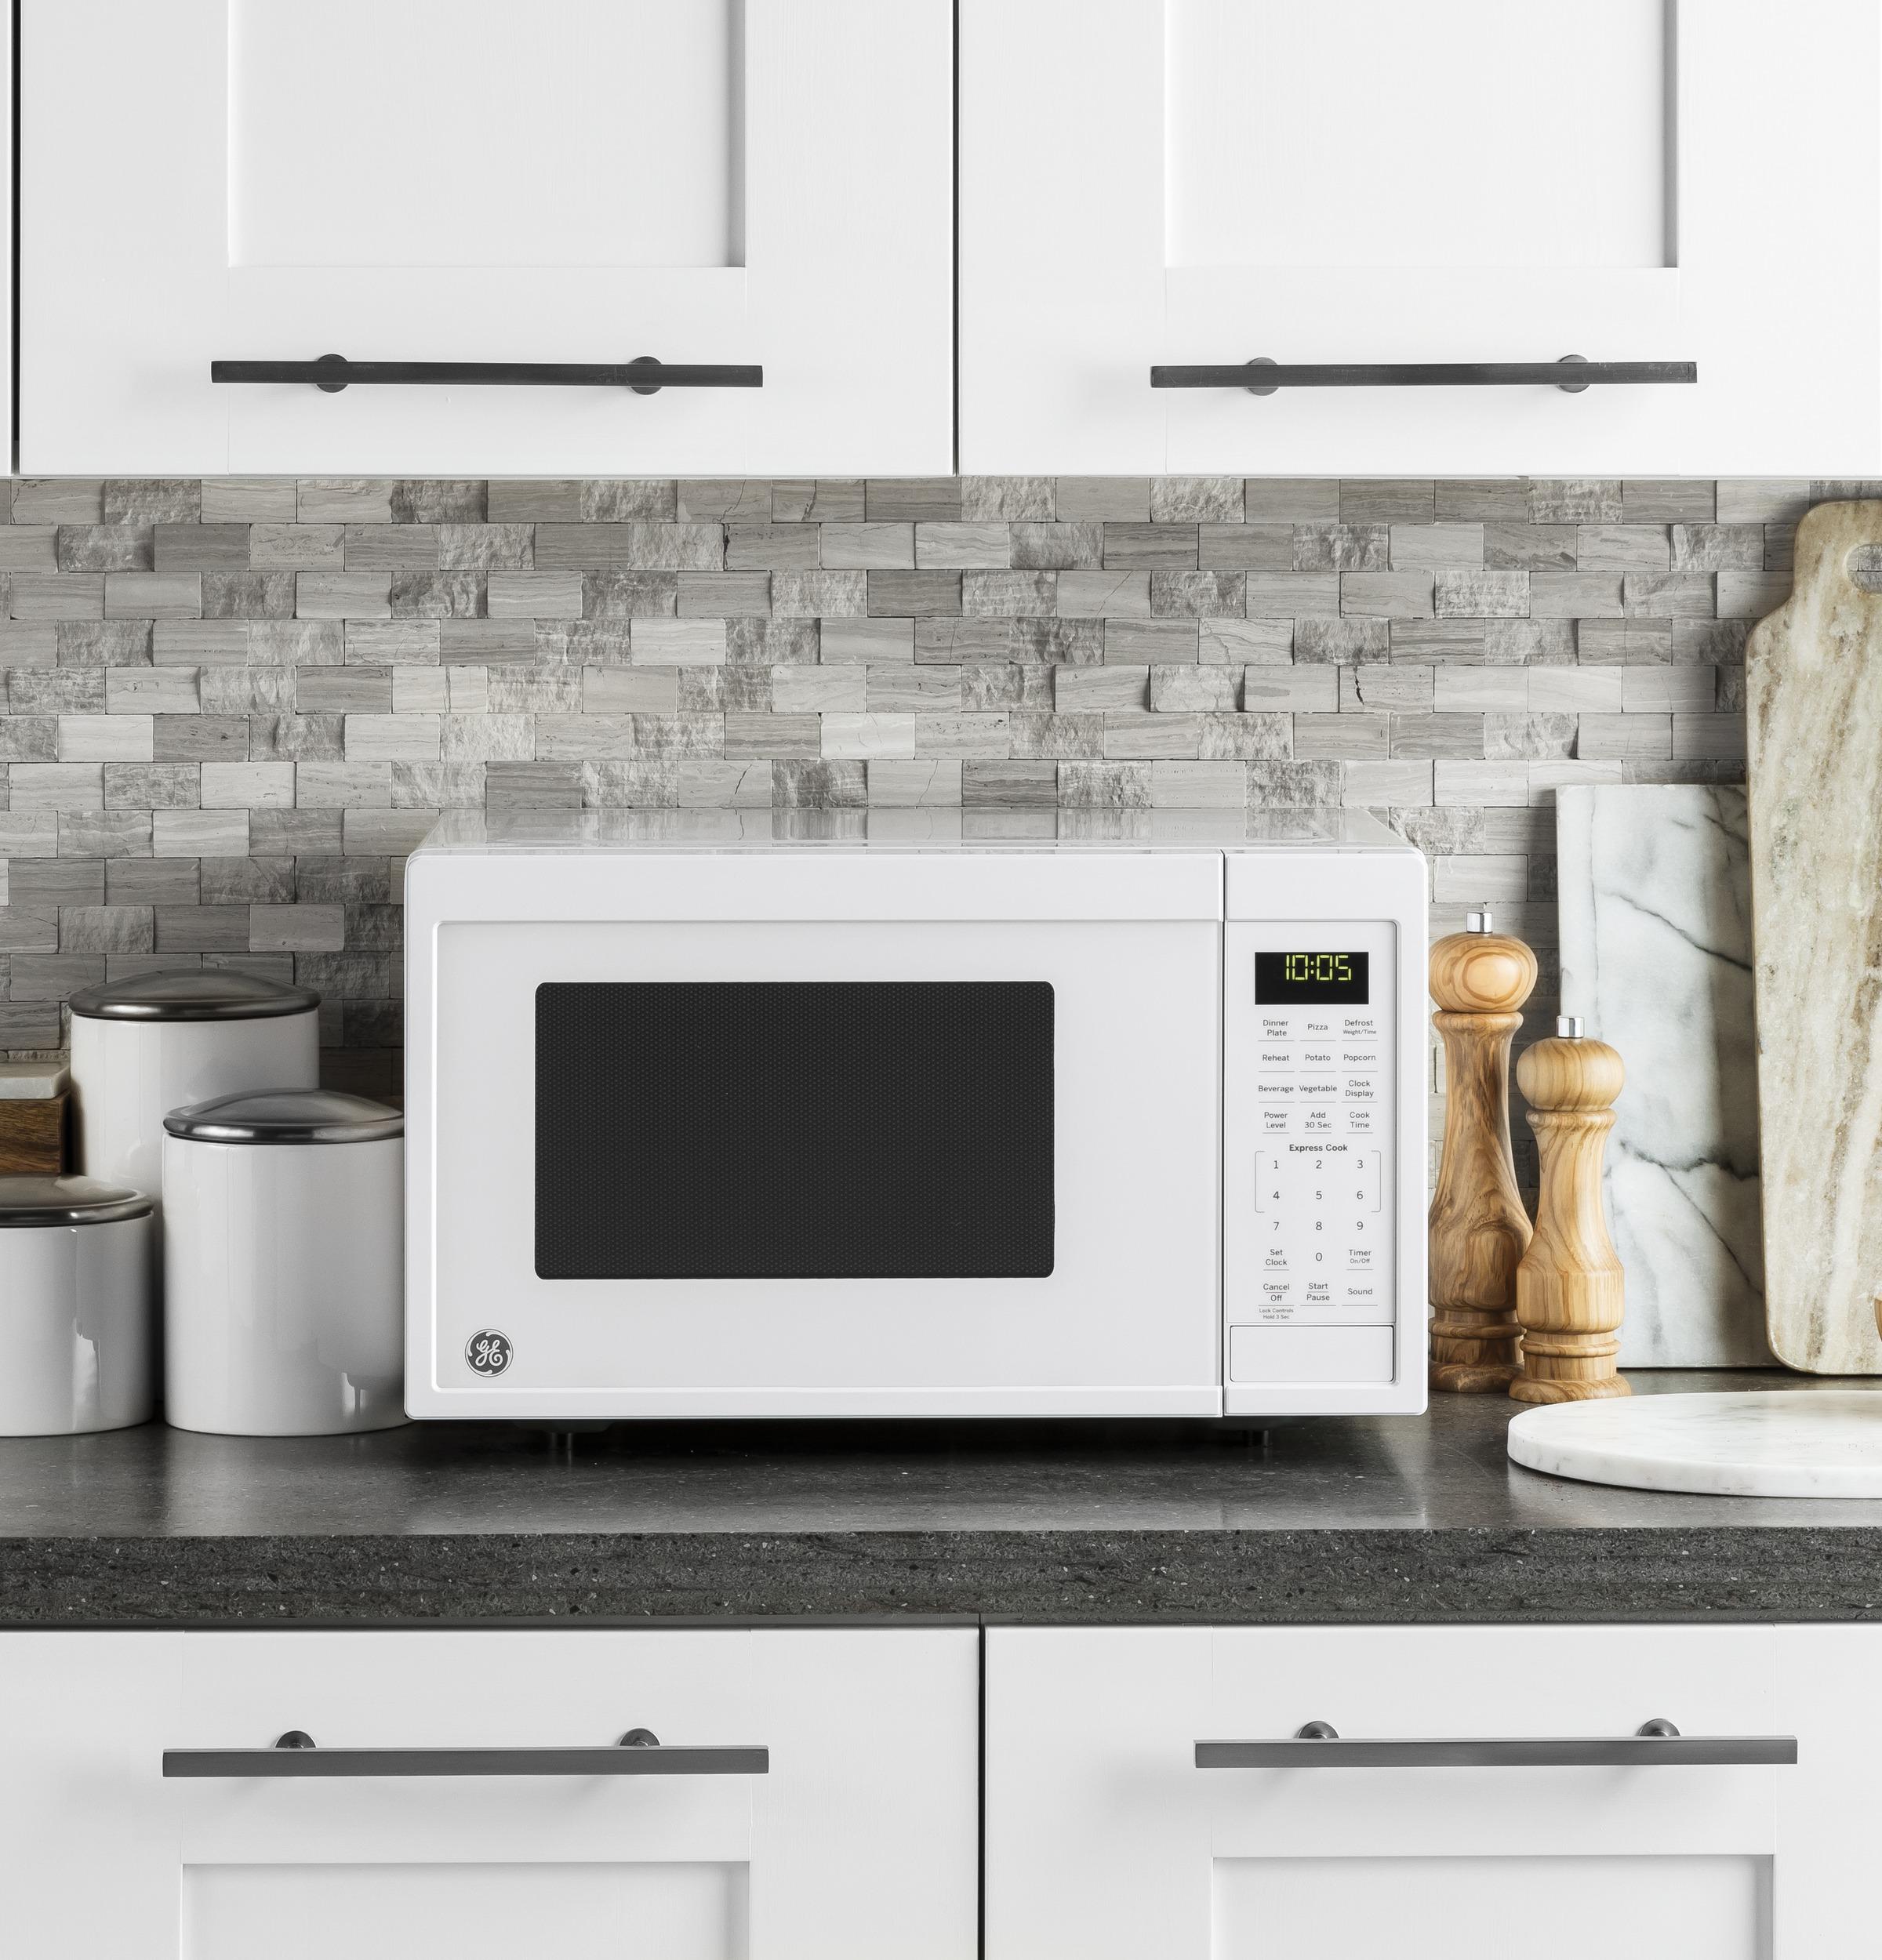 Model: JES1095DMBB | GE® 0.9 Cu. Ft. Capacity Countertop Microwave Oven